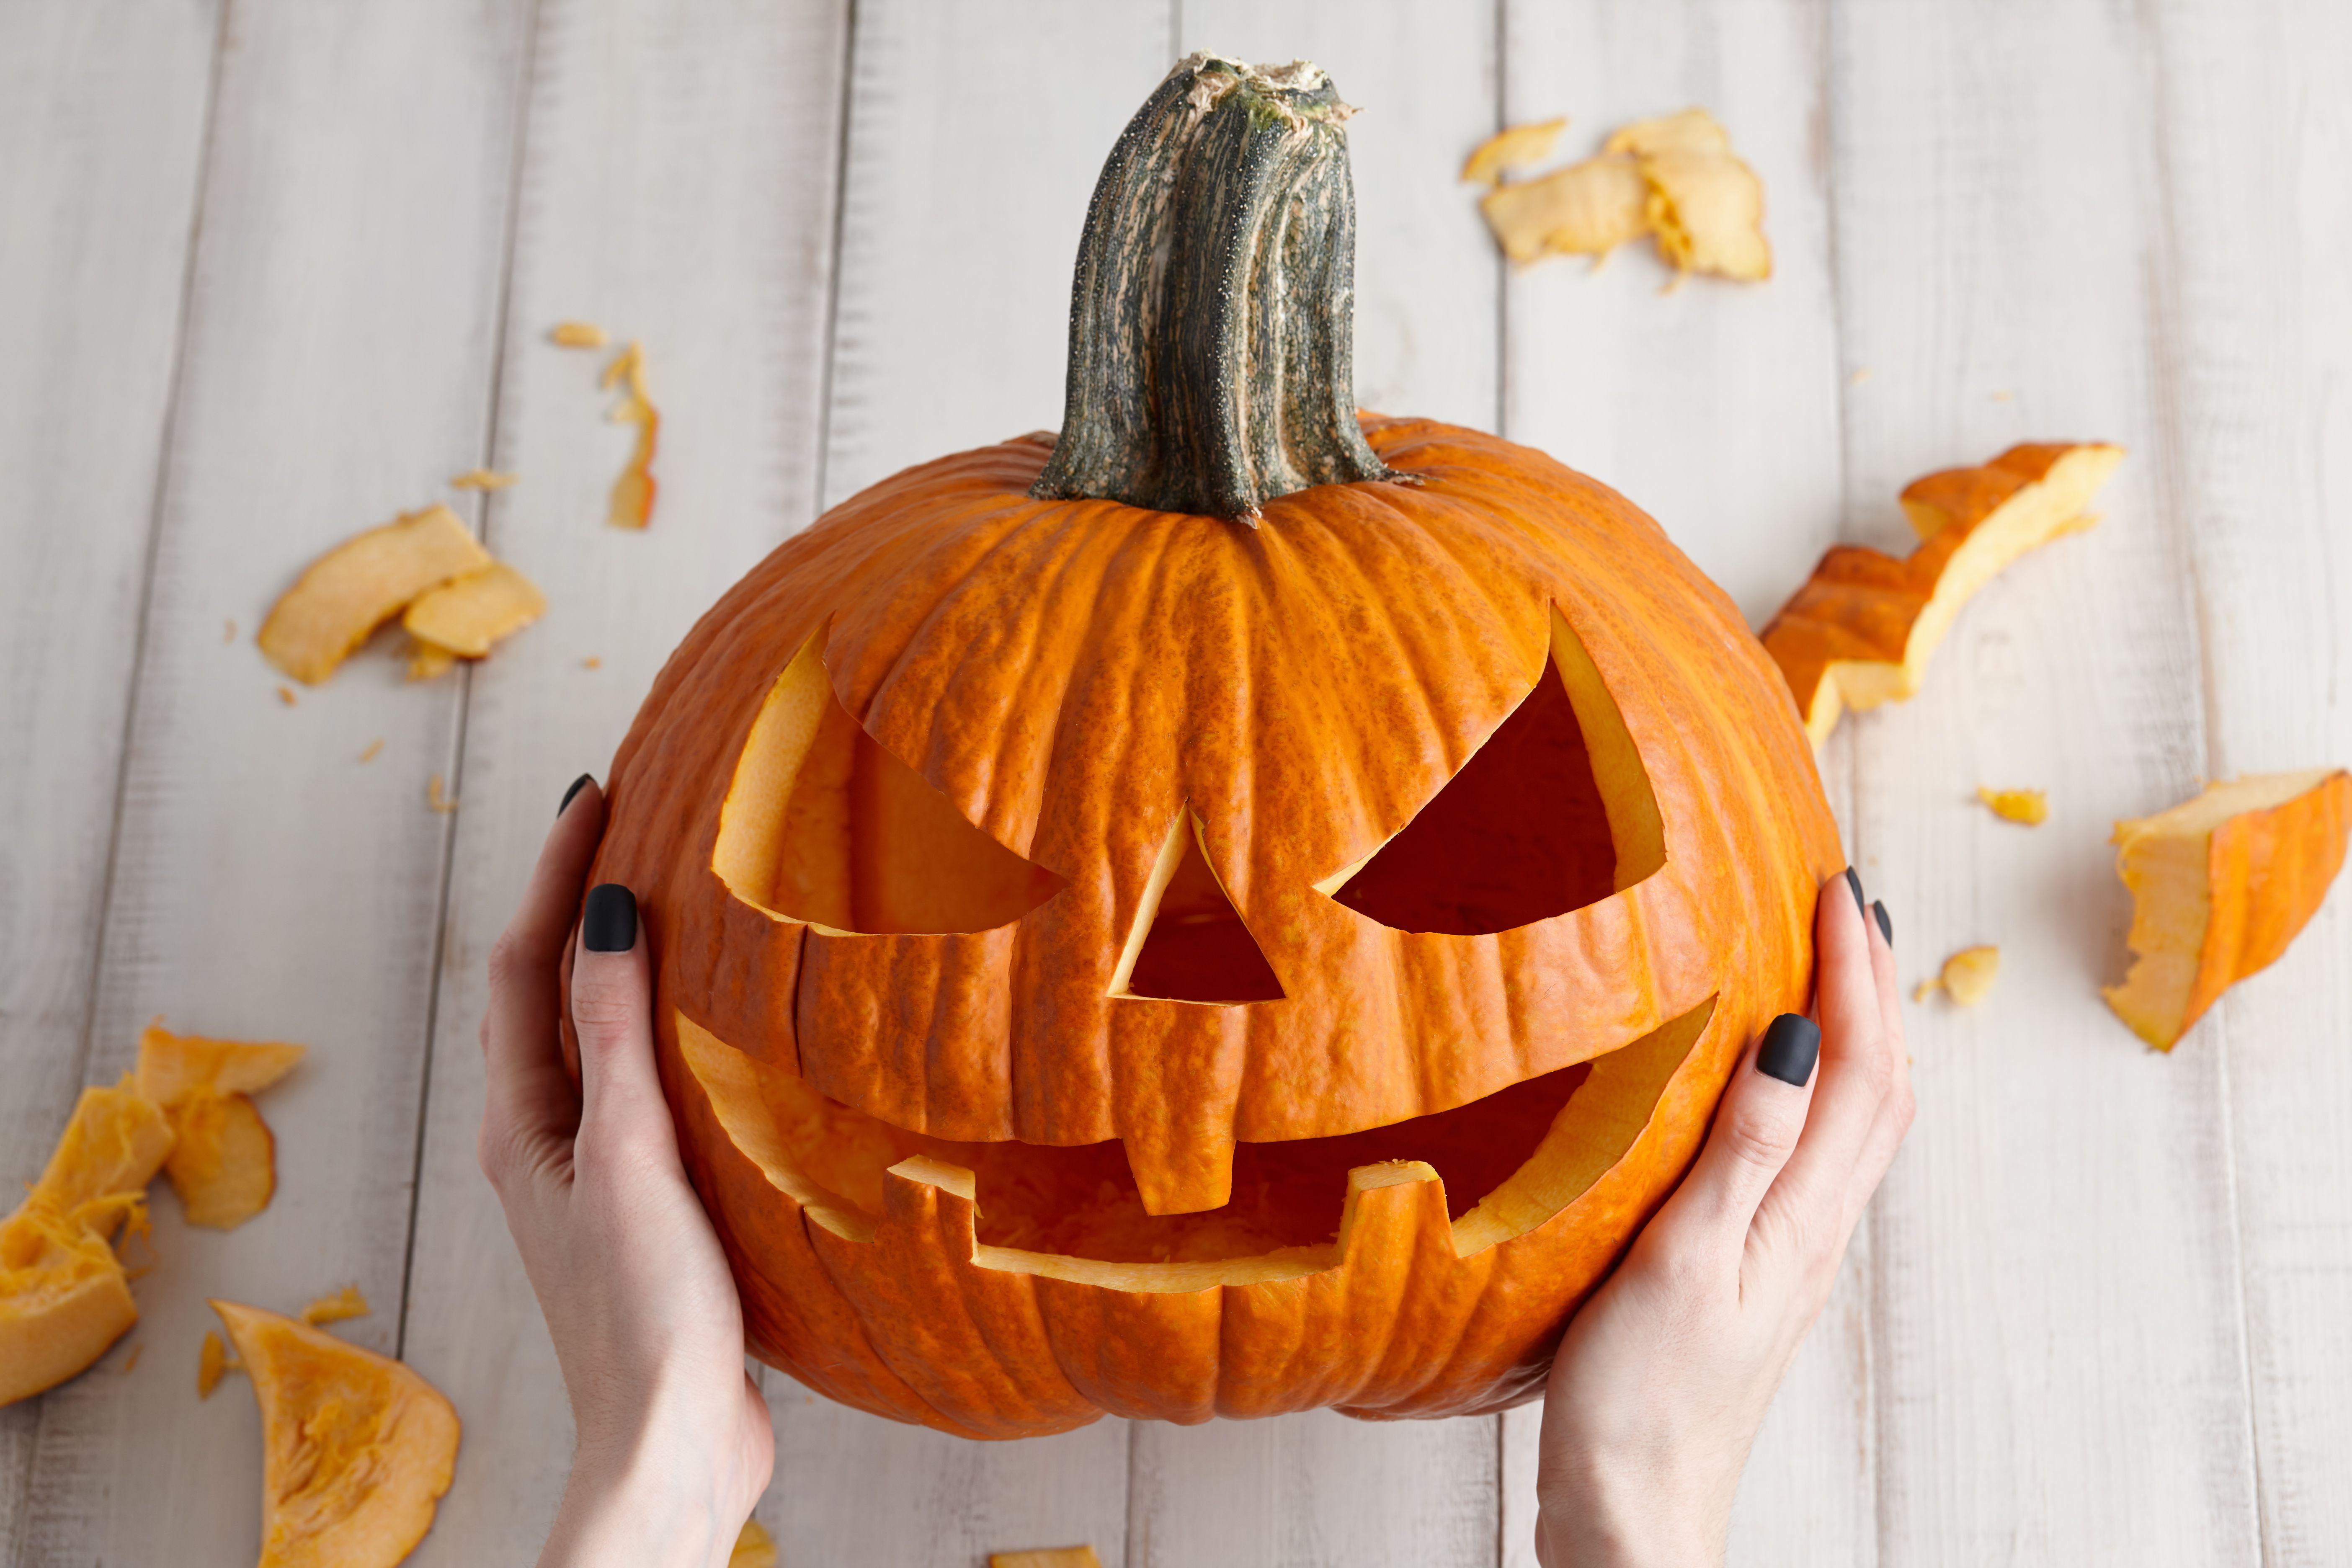 Carving halloween pumpkin into jack-o-lantern, close up view